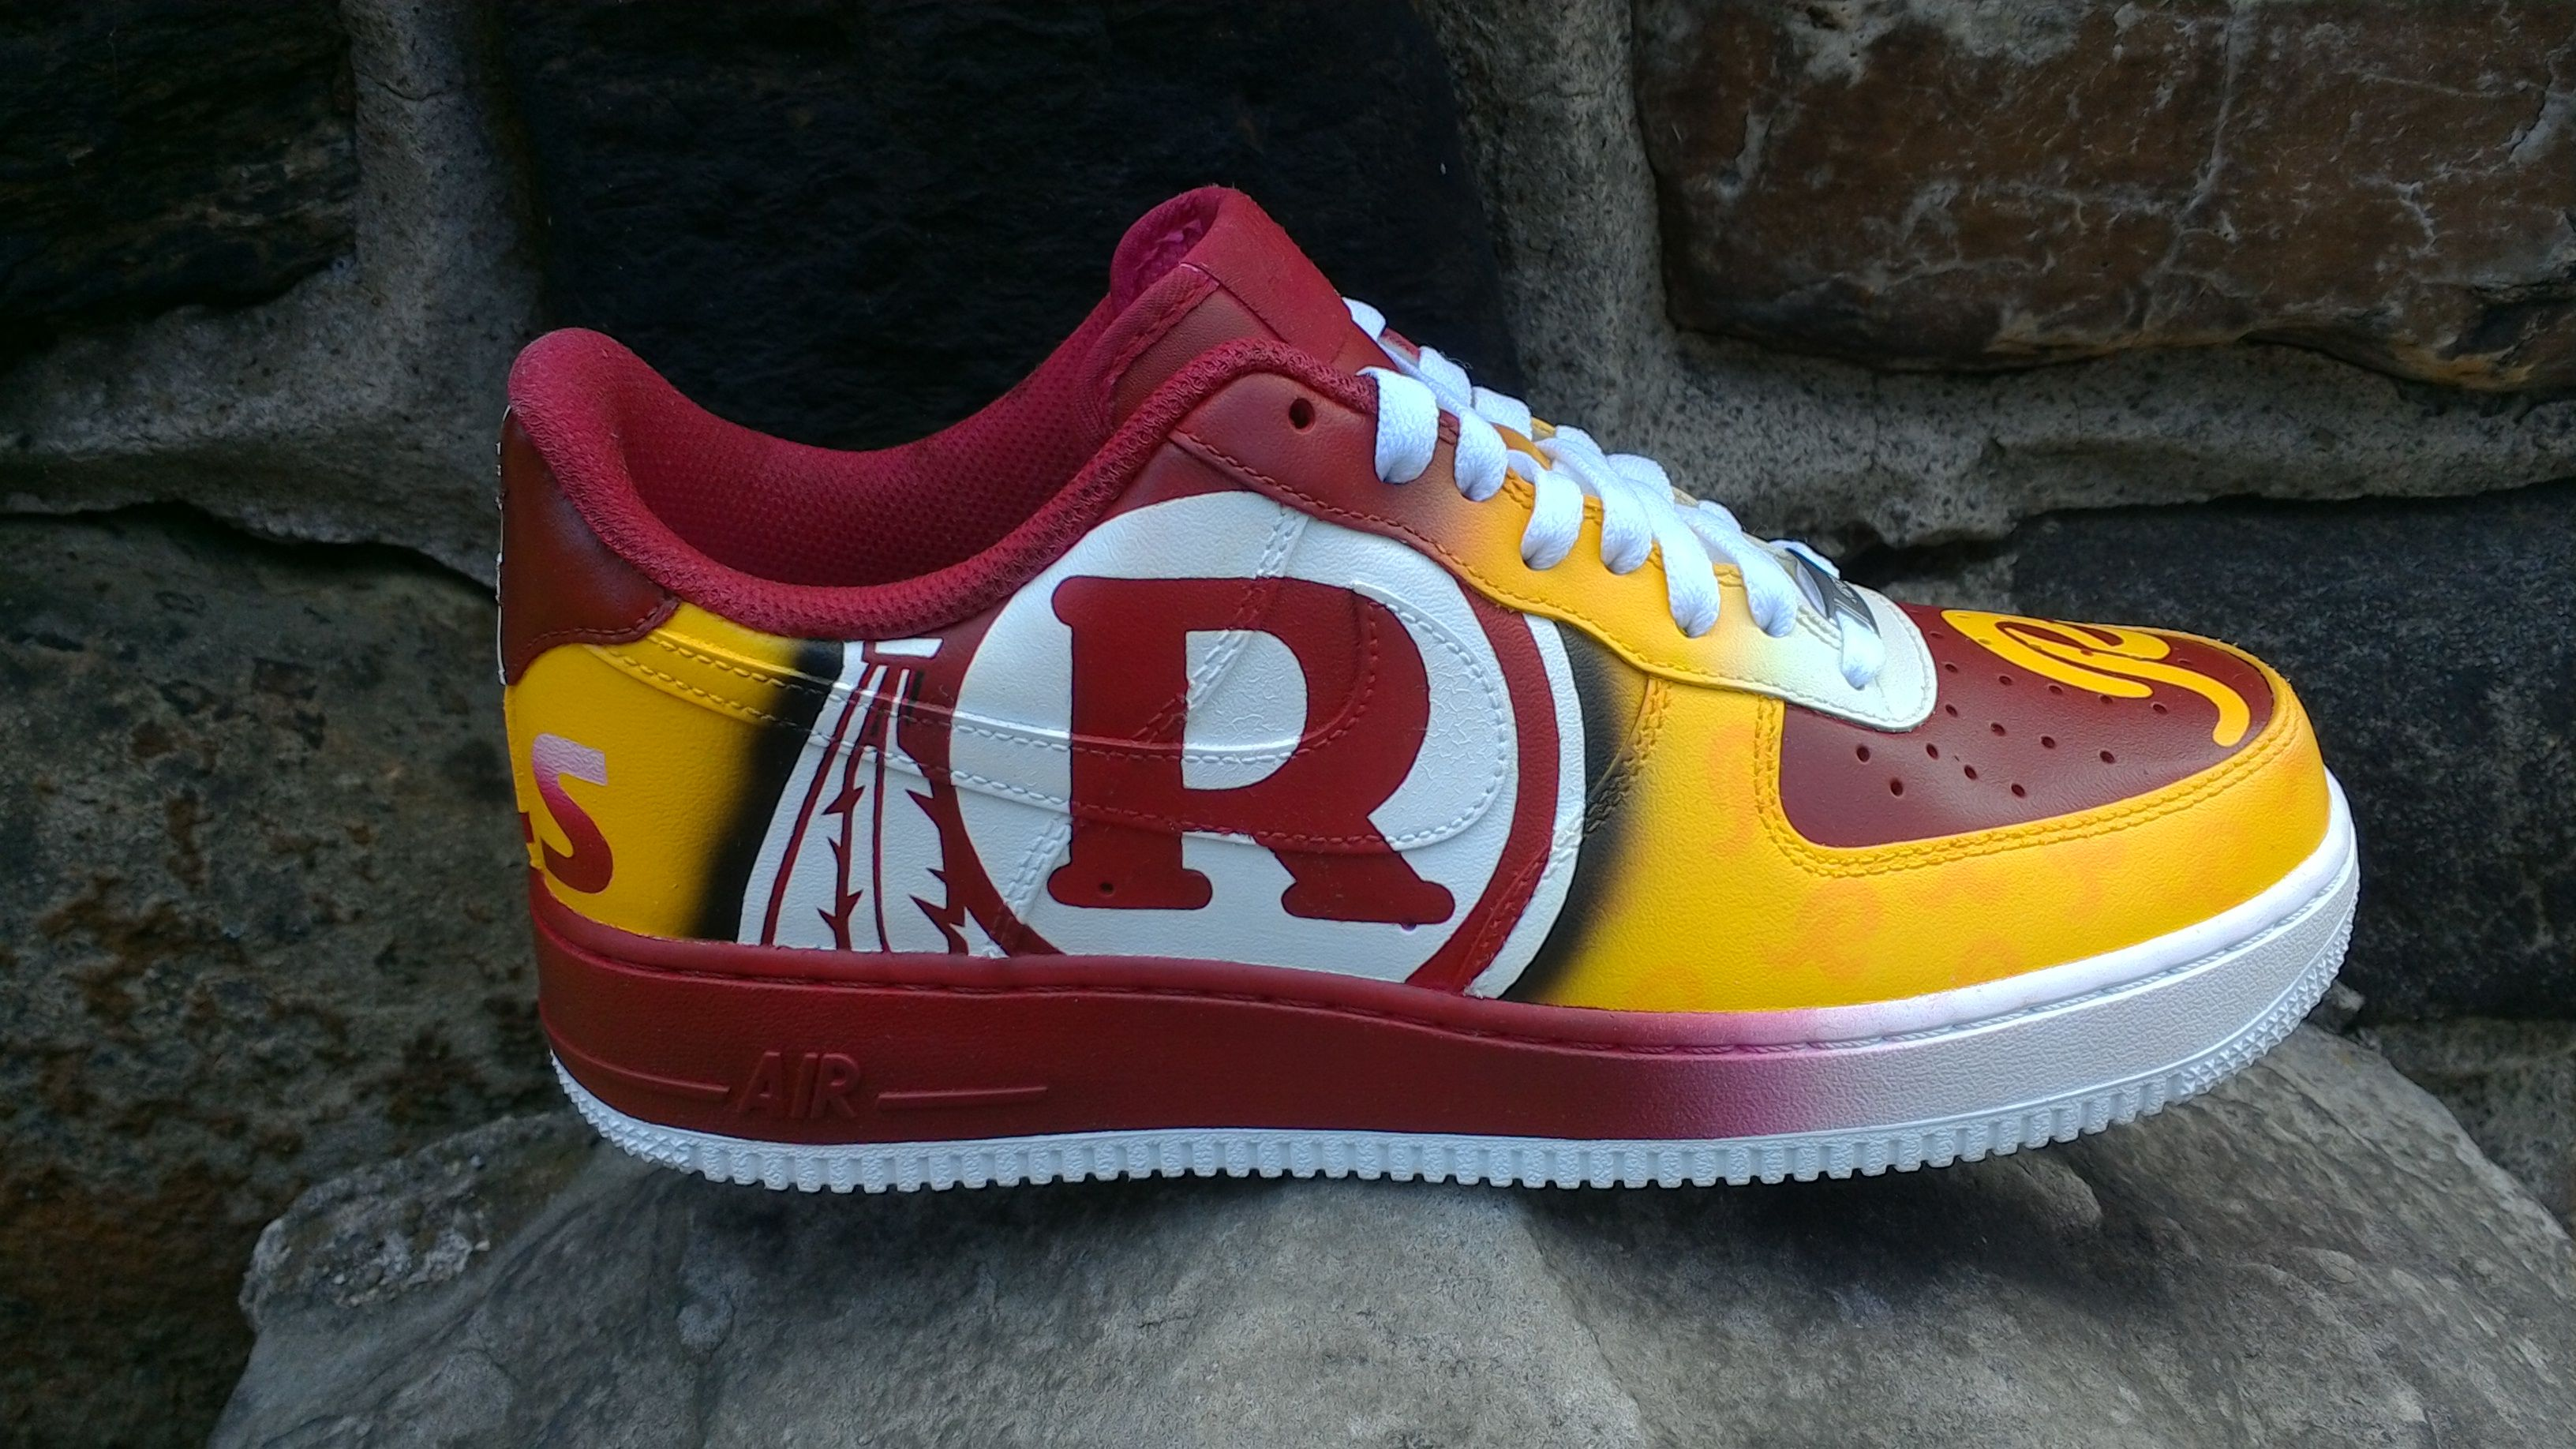 15481650 Custom Painted Washington Redskins sneaker | REDSKINS | Redskins ...